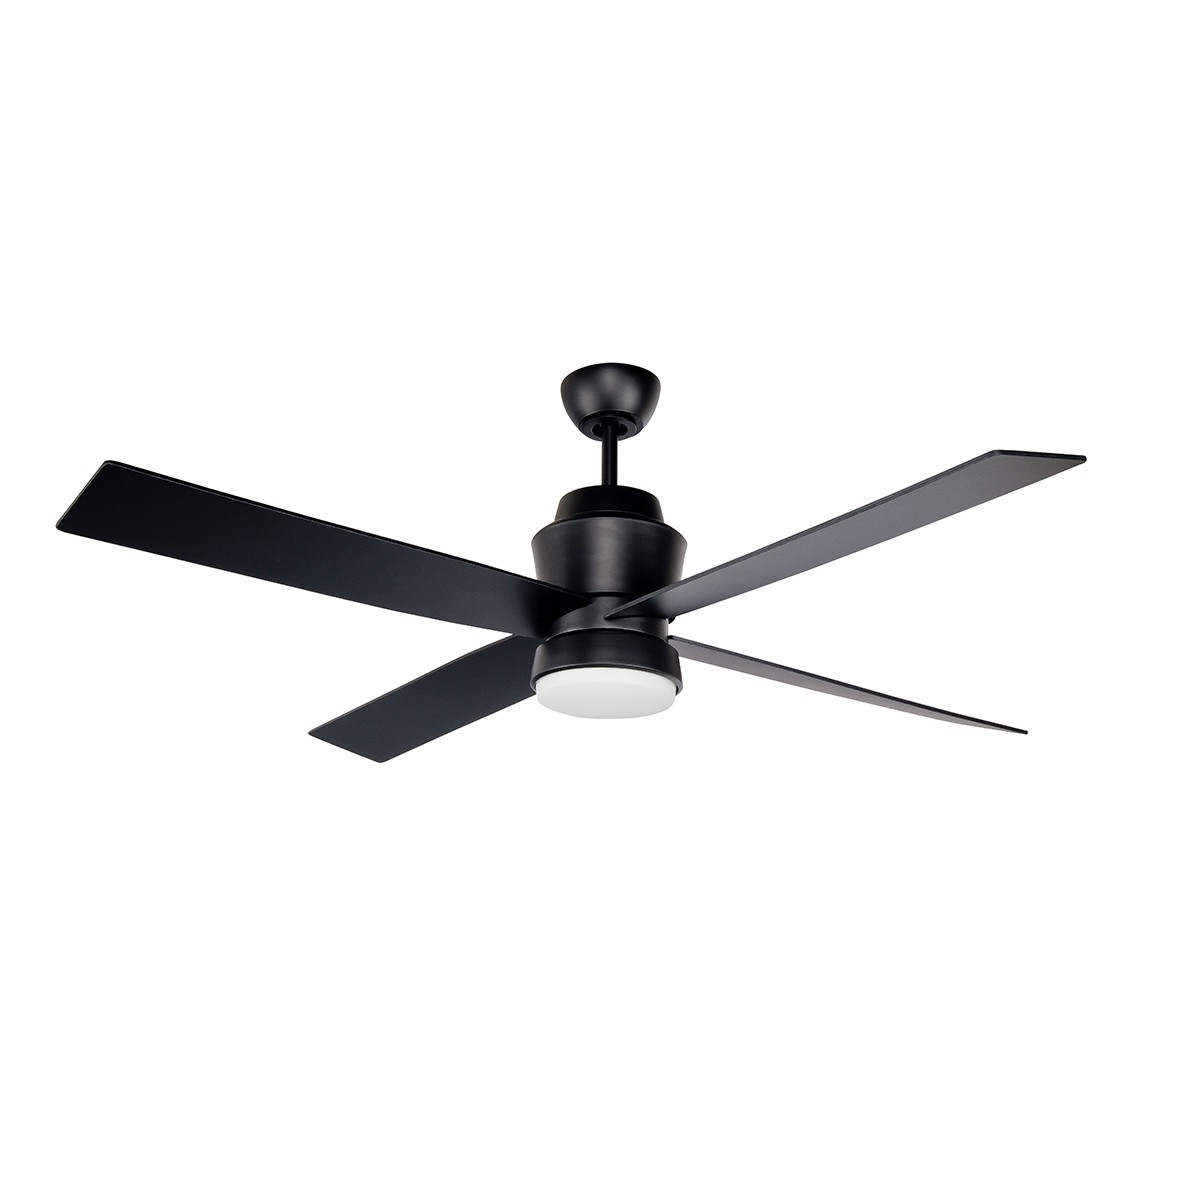 Prologue Outdoor Ceiling Fan :: Stori Modern Regarding Preferred Grey Outdoor Ceiling Fans (View 17 of 20)